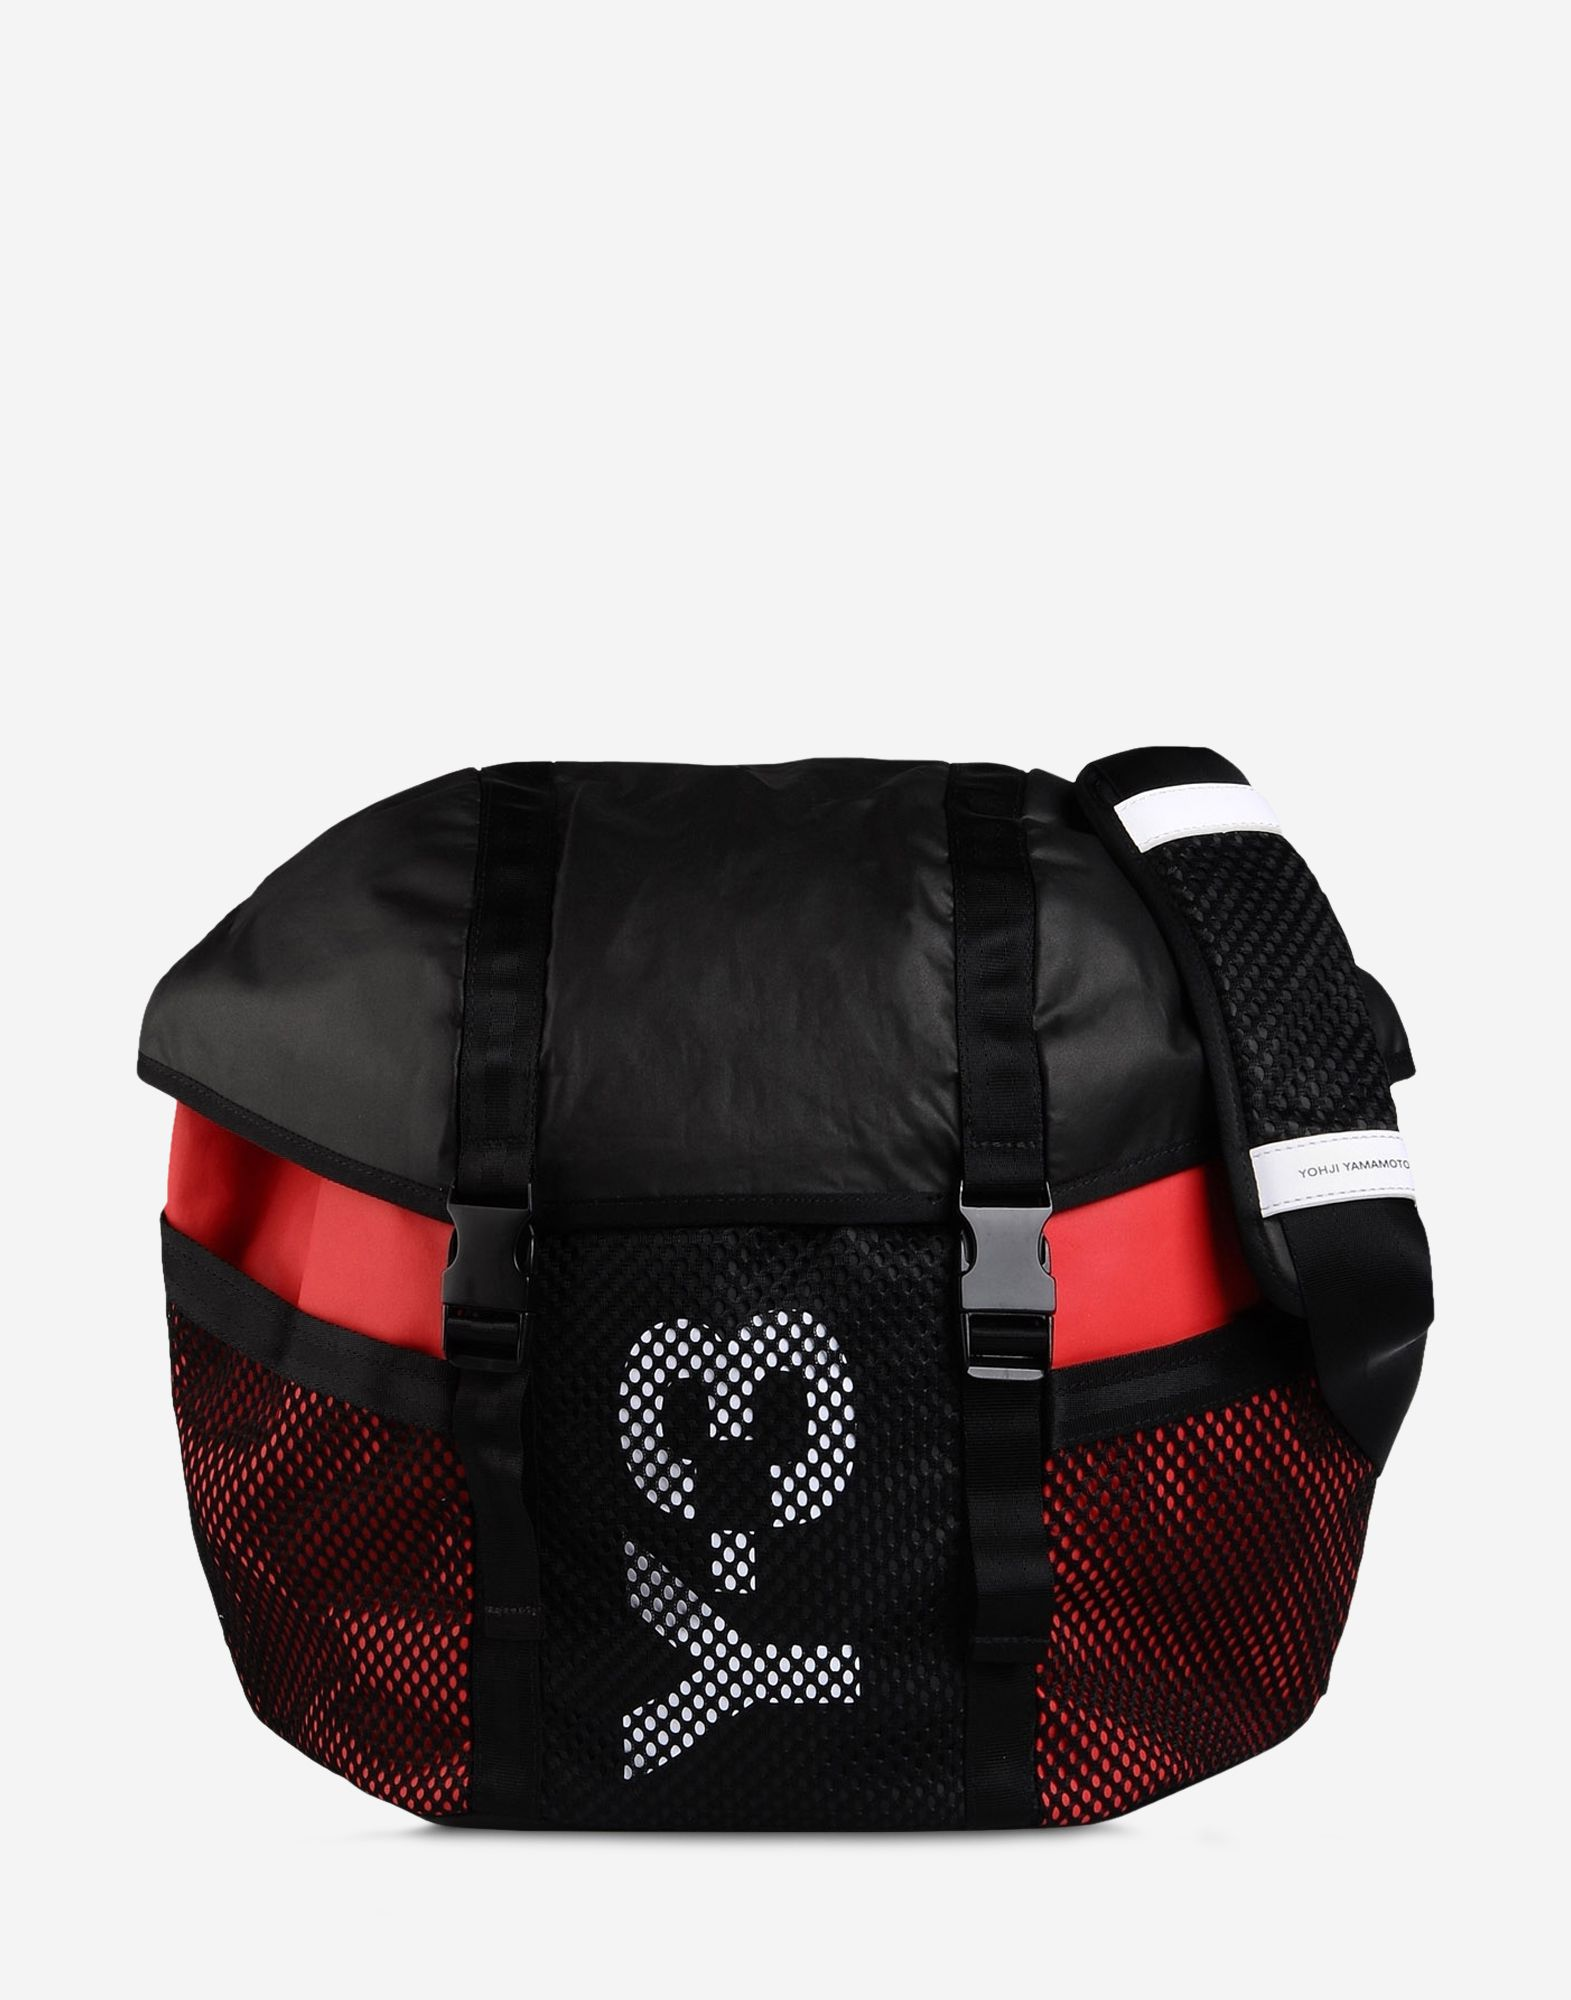 ... Y-3 Y-3 FS Messenger Bag Large fabric bag E ... 489ffc40534b4